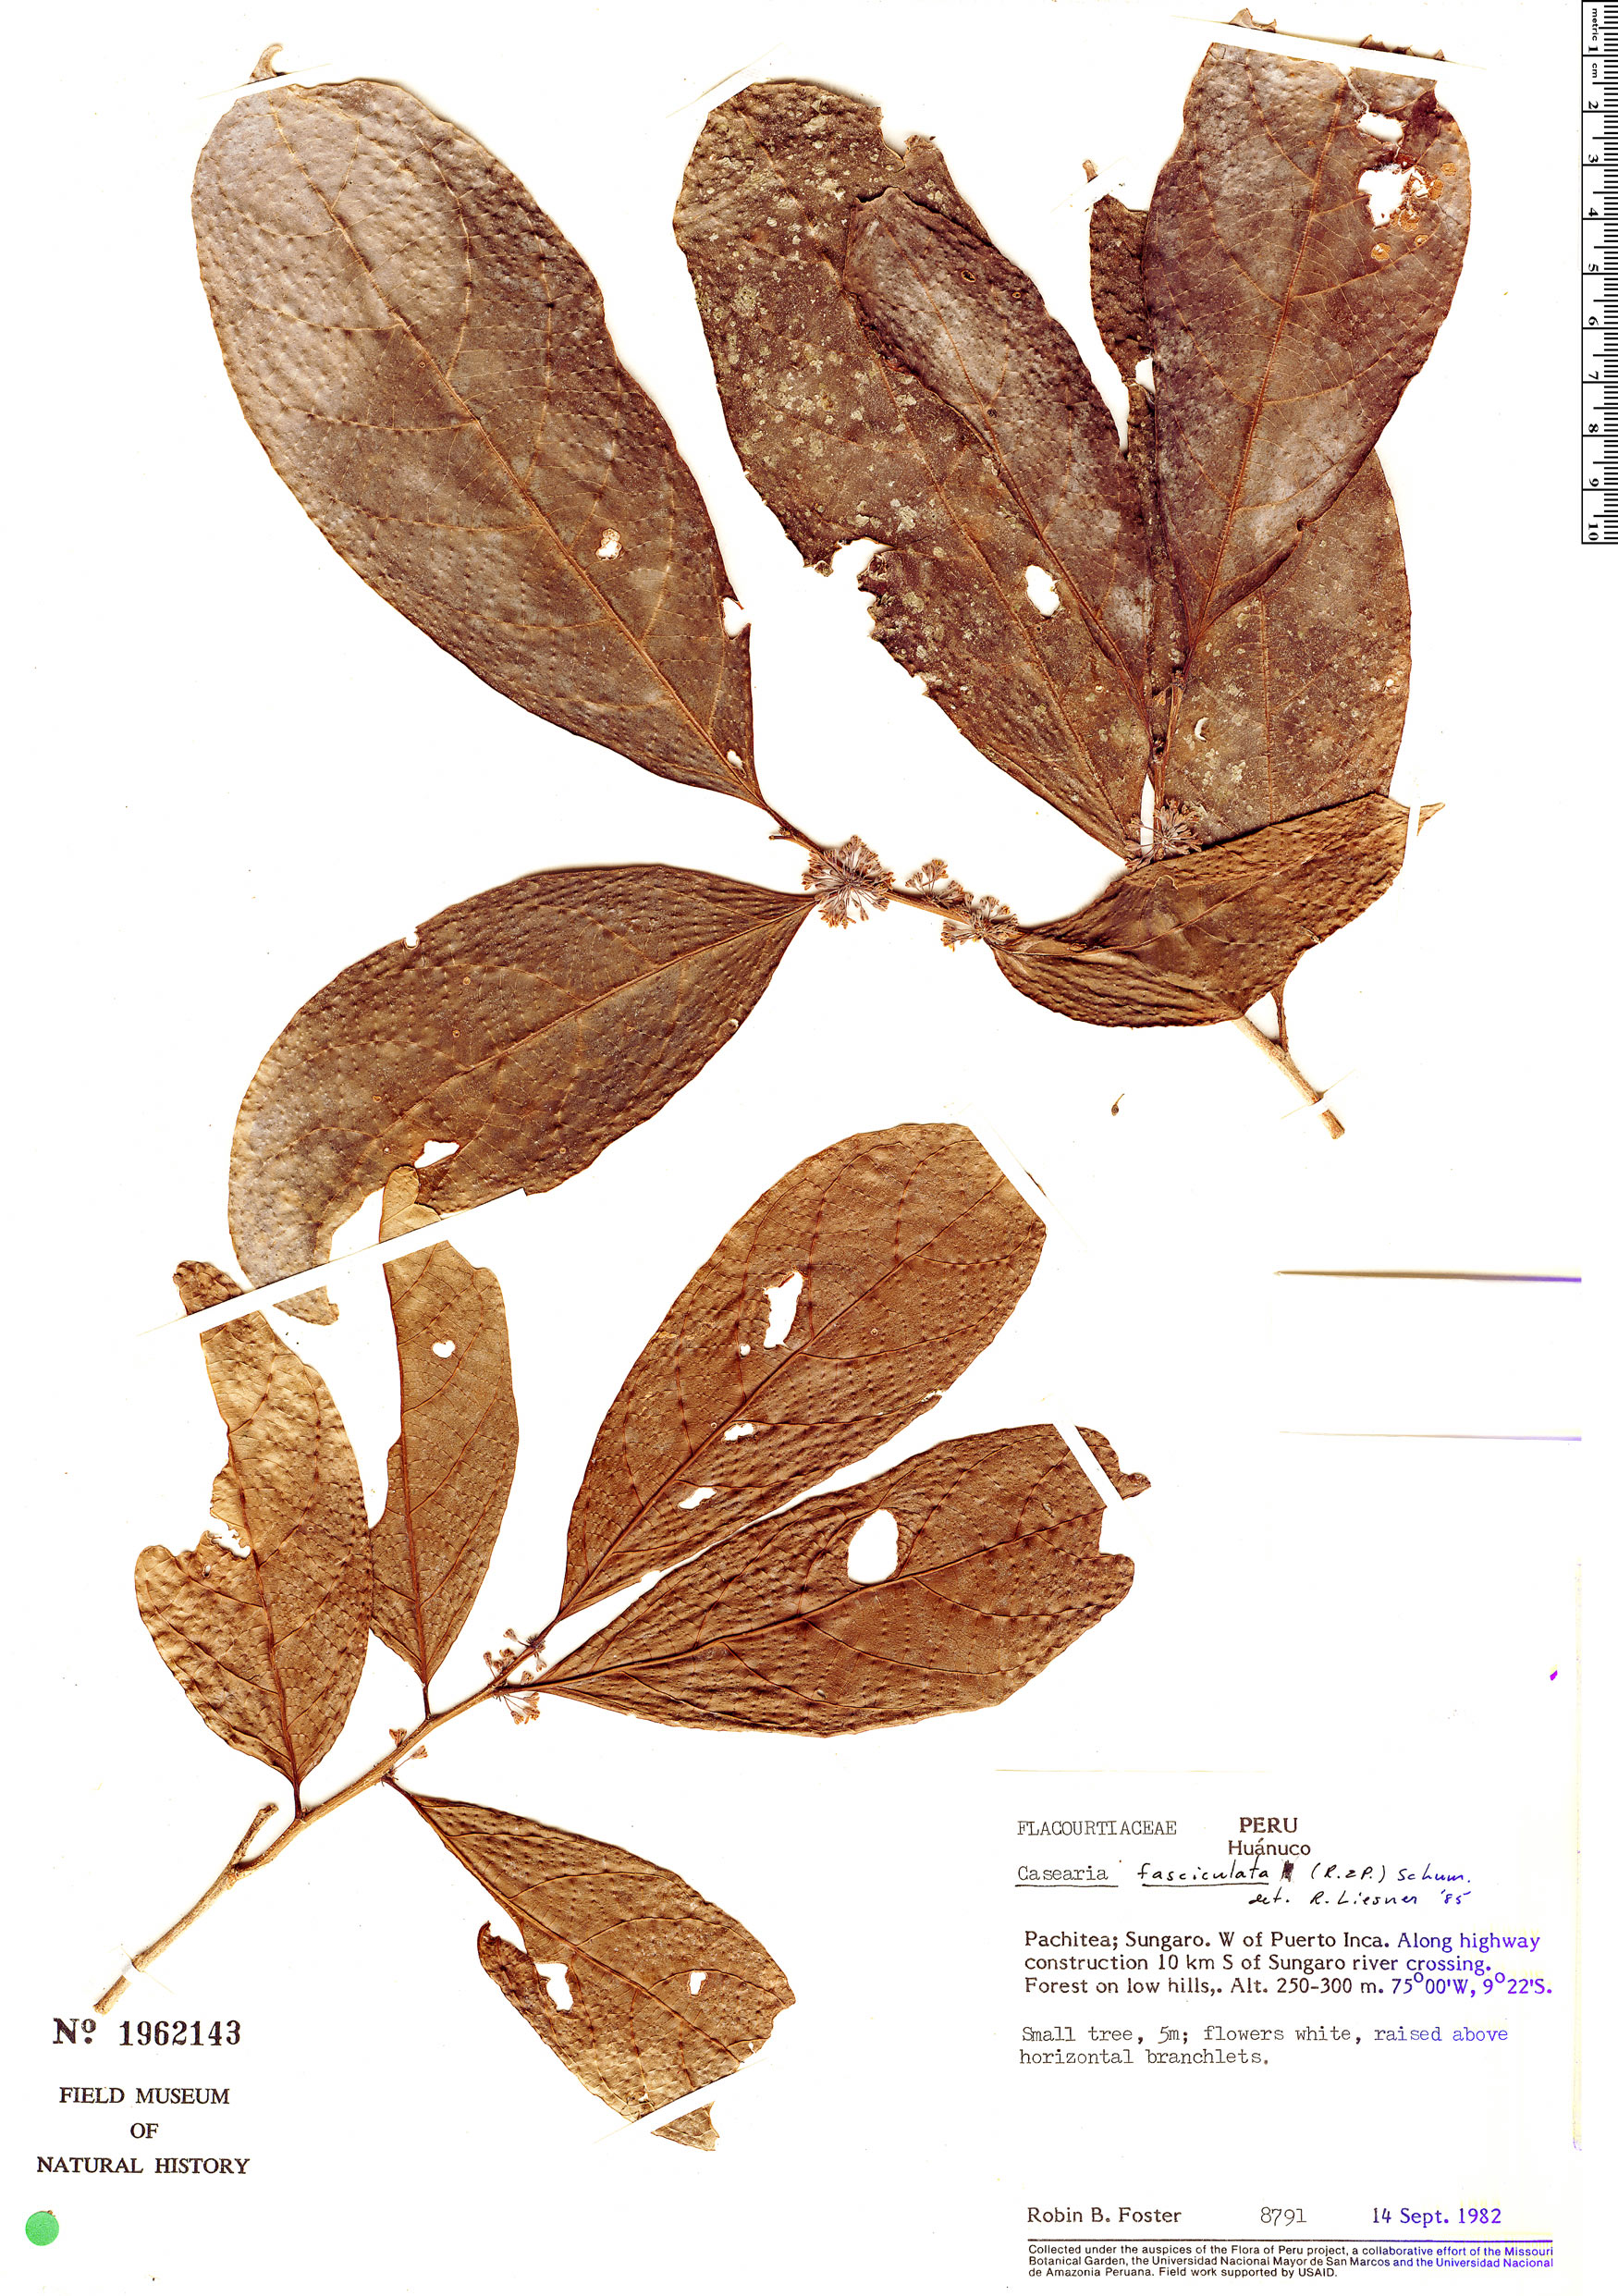 Specimen: Casearia fasciculata